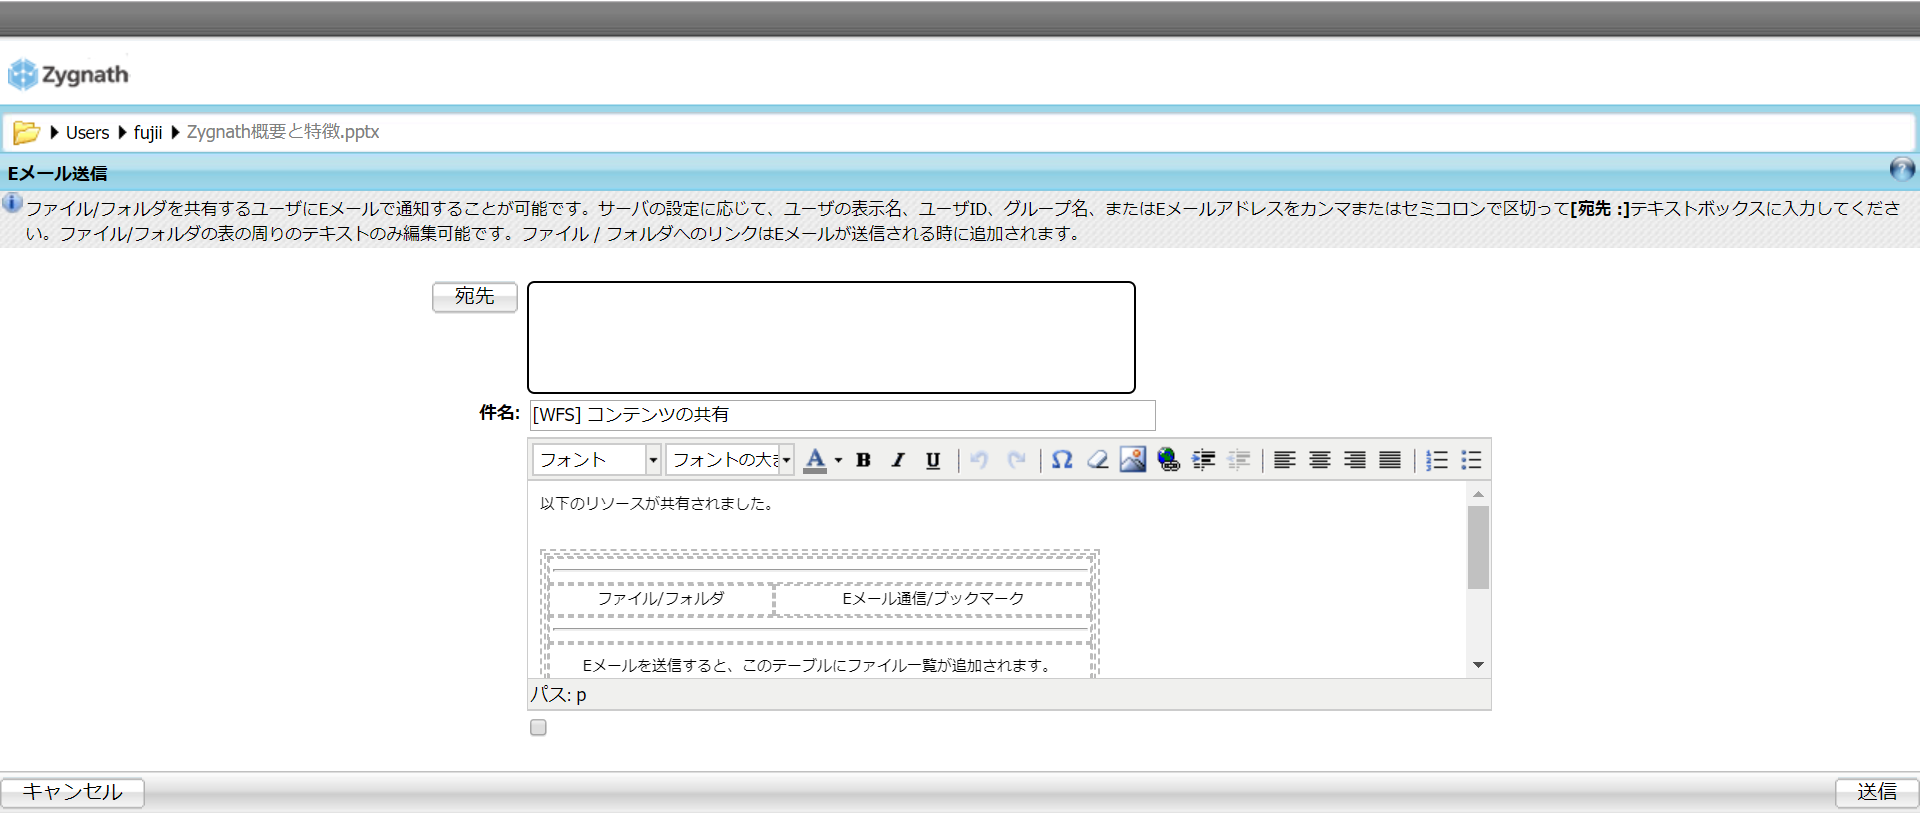 Zygnathのメール送信画面のスクリーンショット